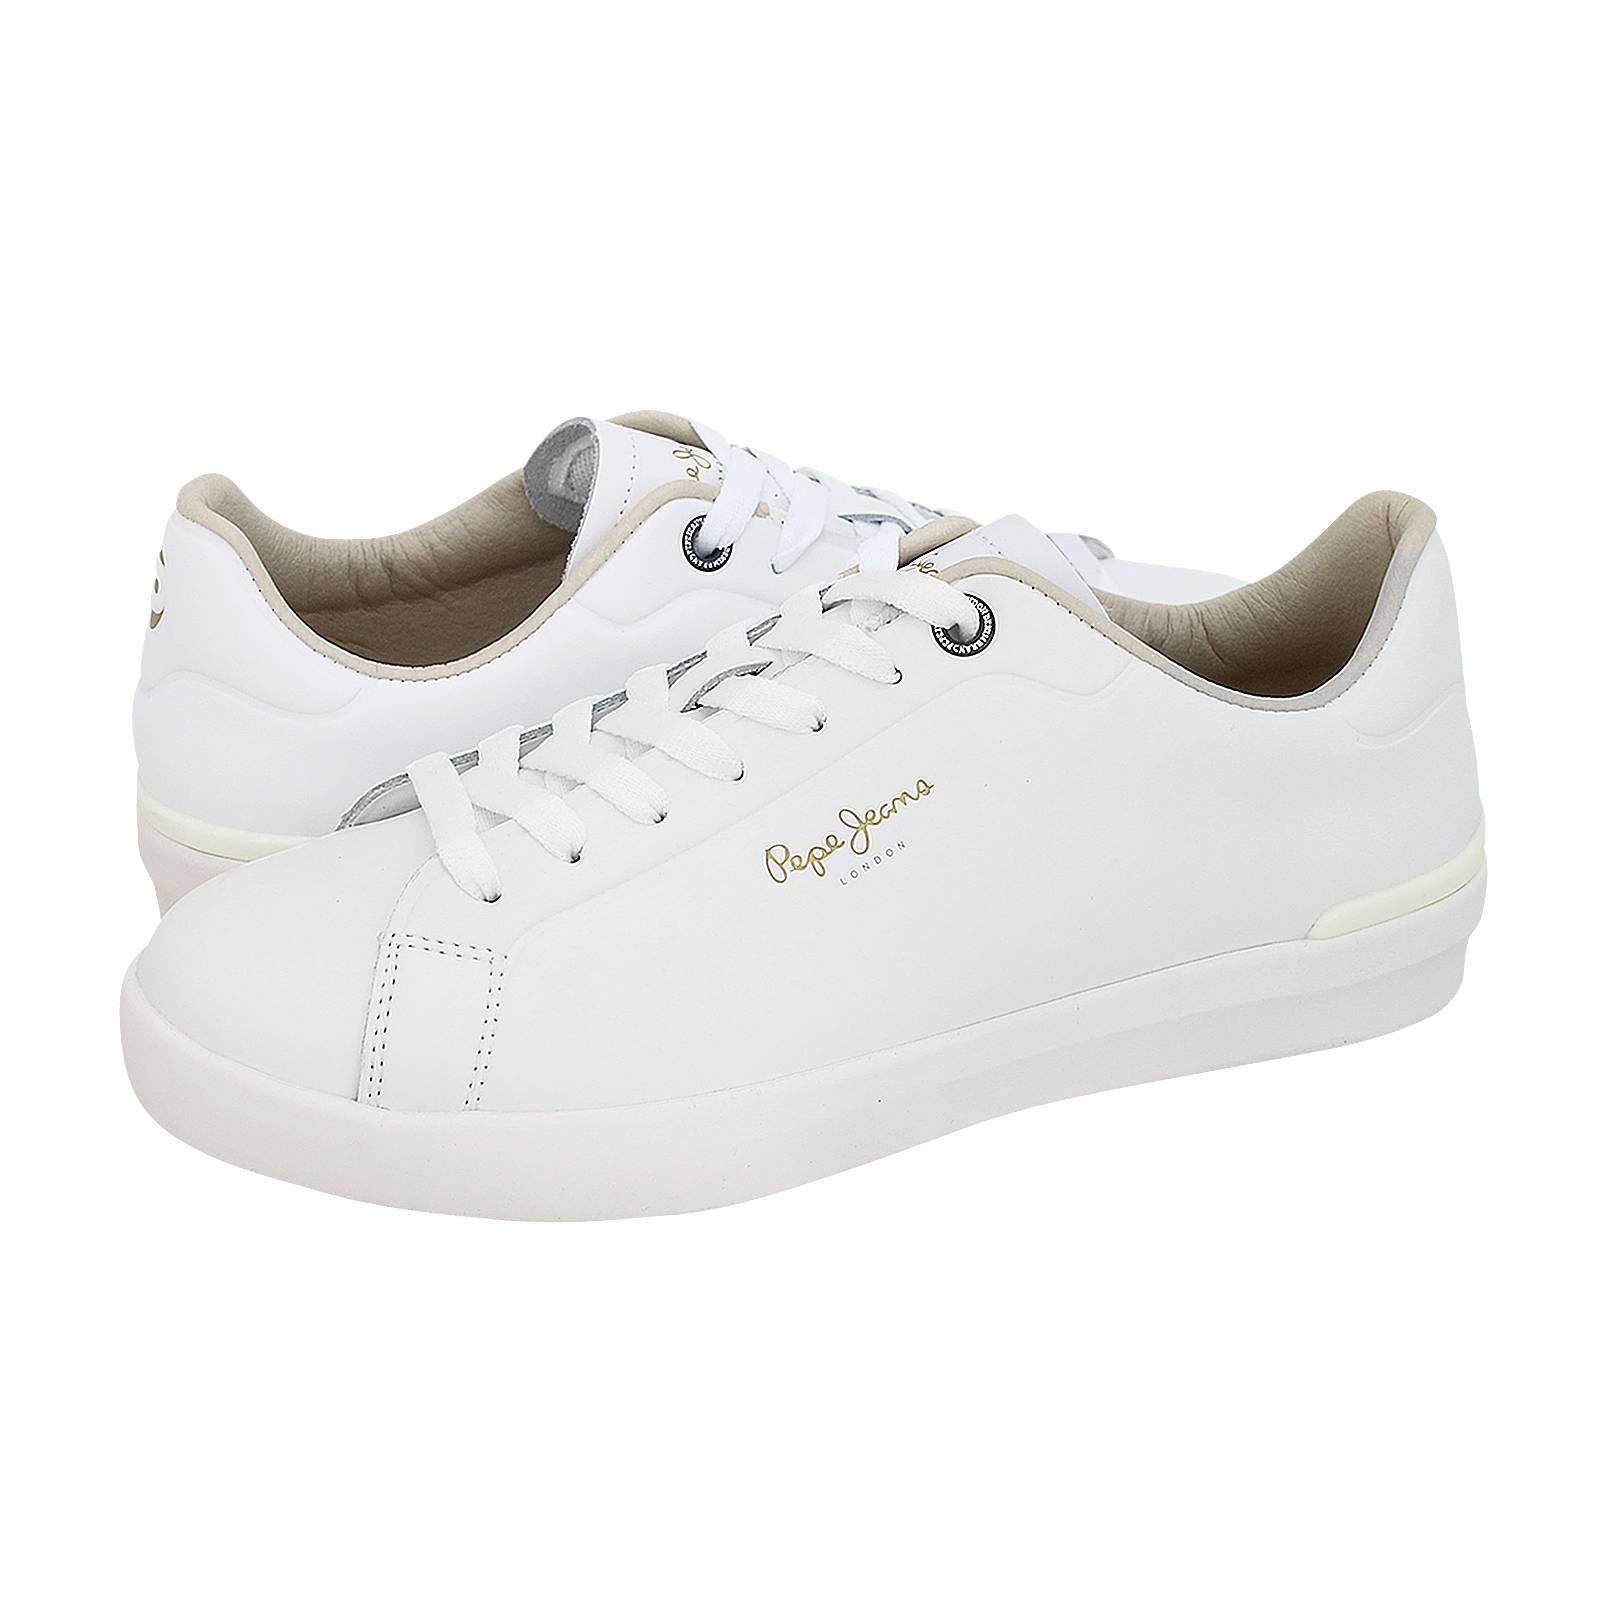 7c0d3b3800e Παπούτσια casual Pepe Jeans Roland LTH